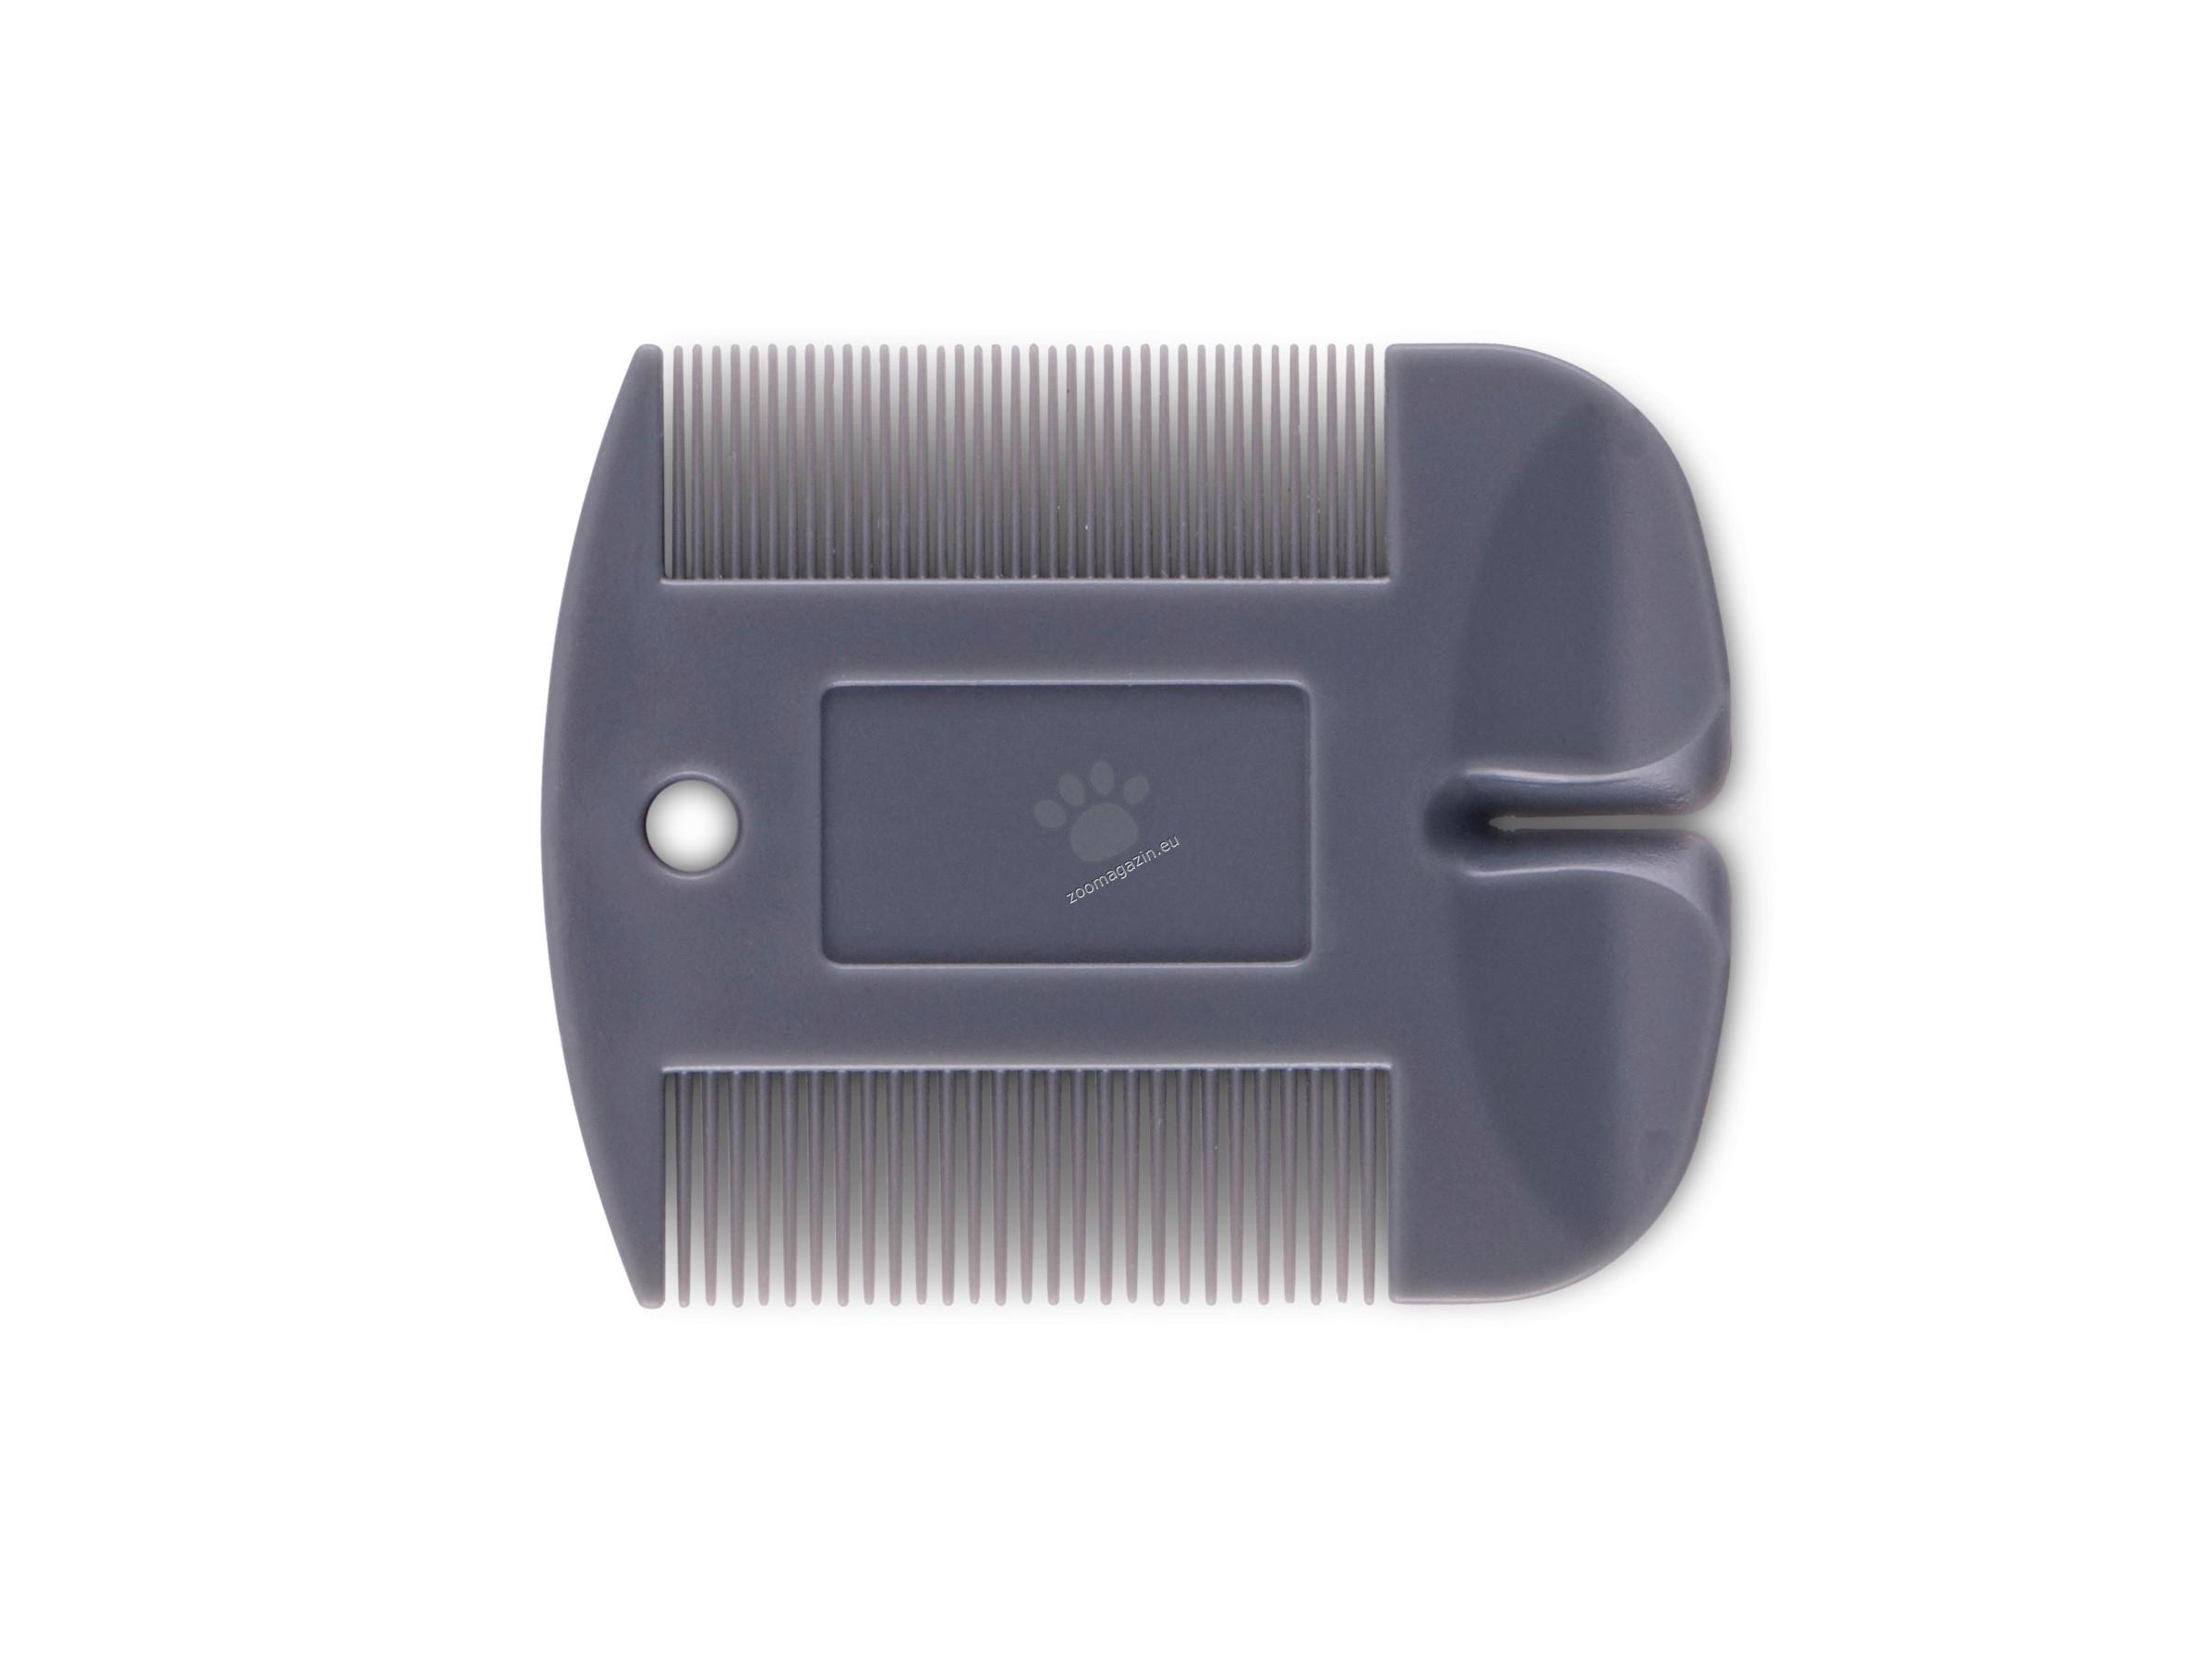 Vadigran Flea and Tick comb - гребен за премахване на бълхи и кърлежи 6.5 см.